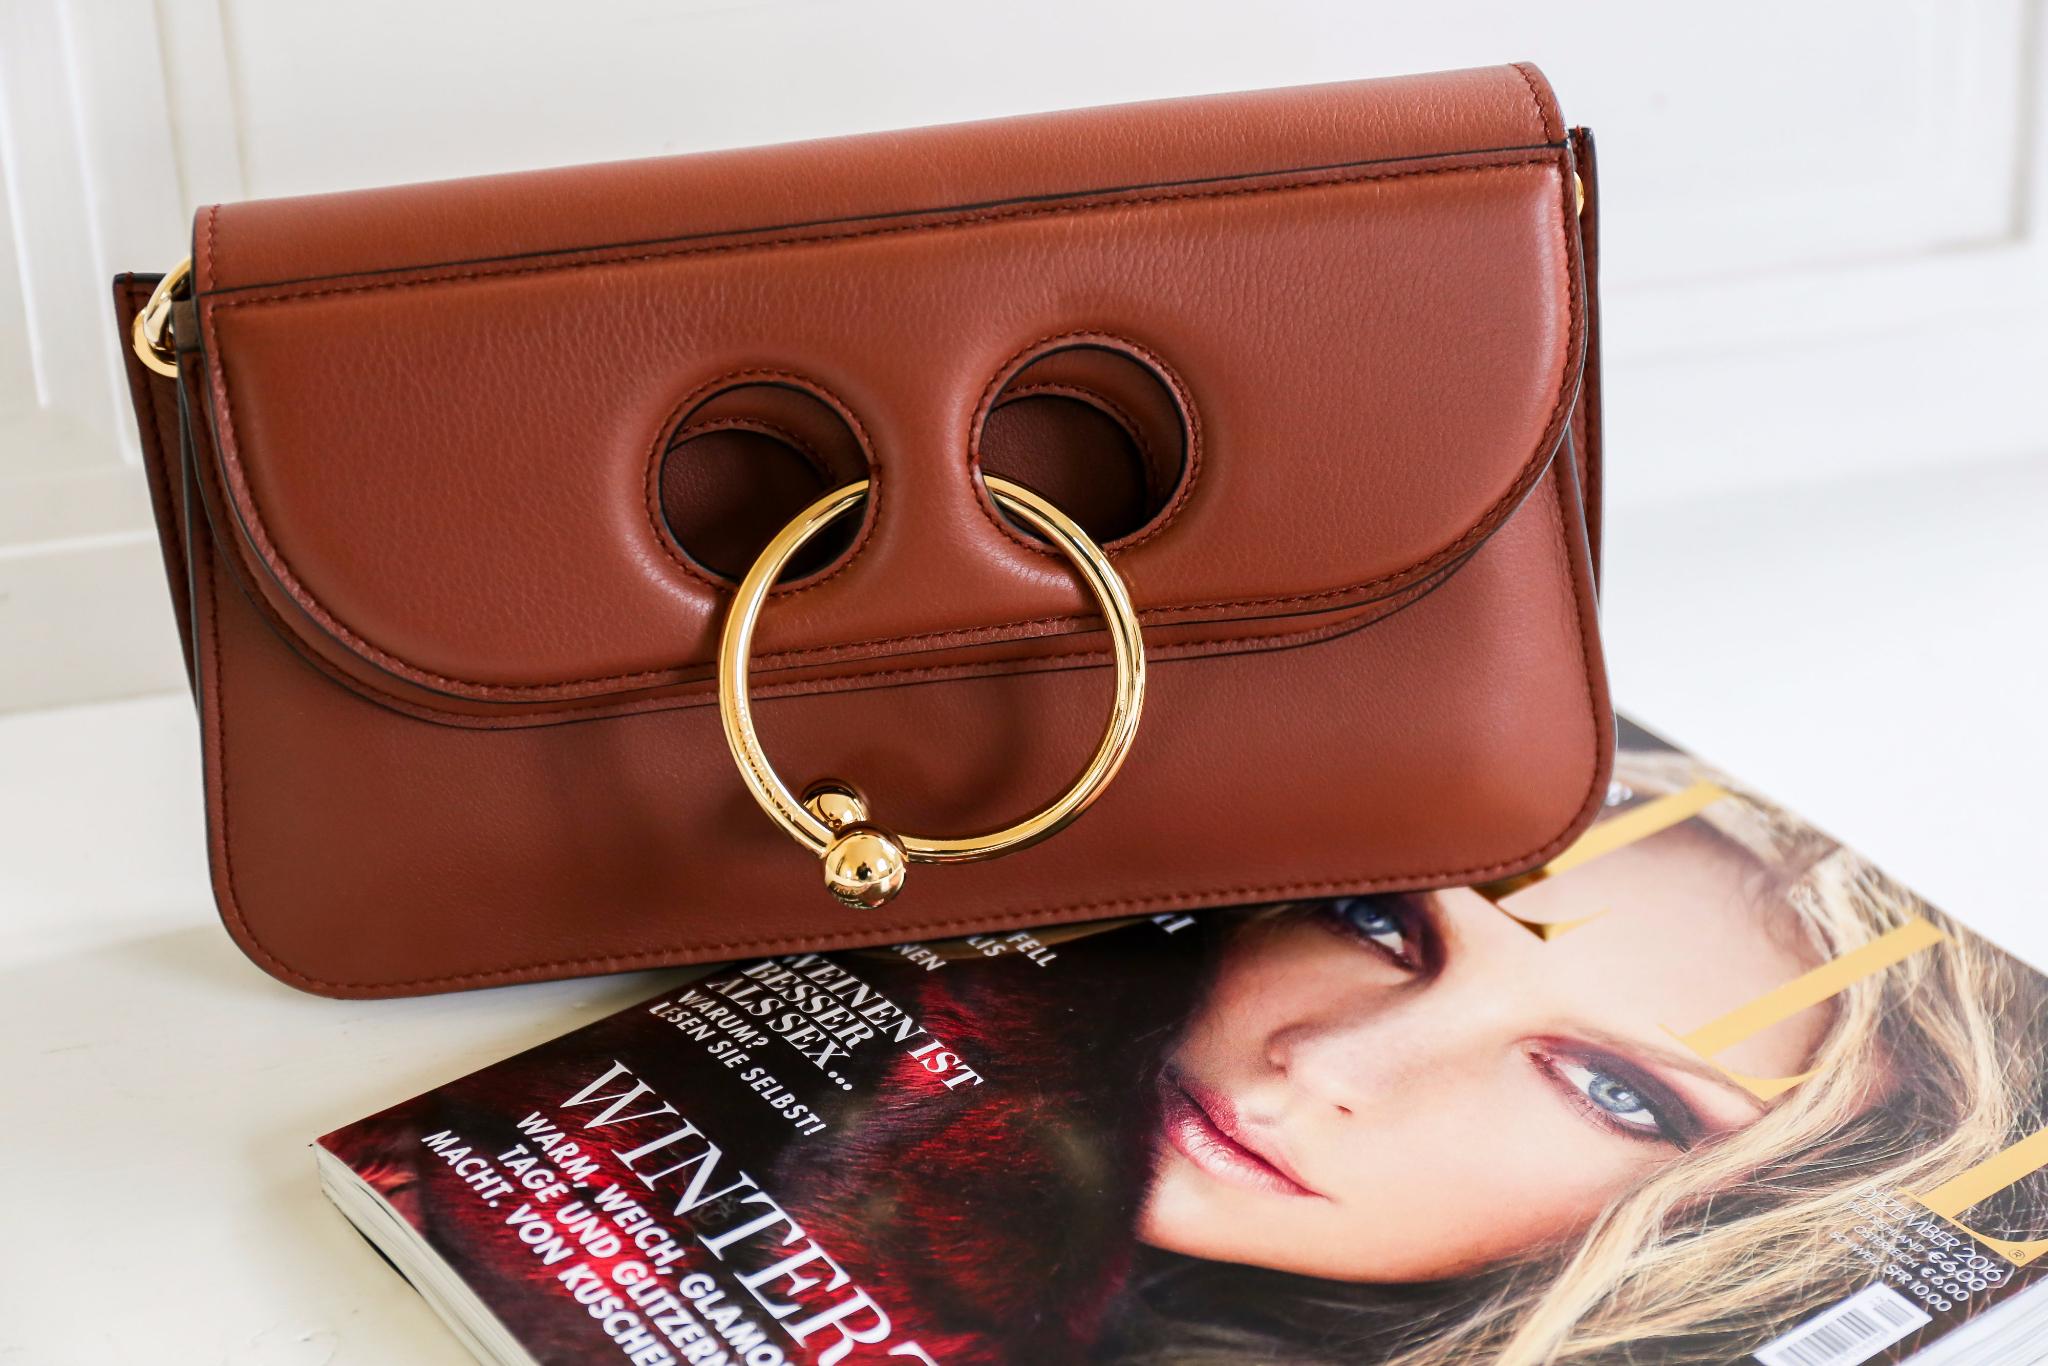 MOD-by-Monique-Fashion-Shopping-New-in-Pierce-Bag-JWAnderson-4-1